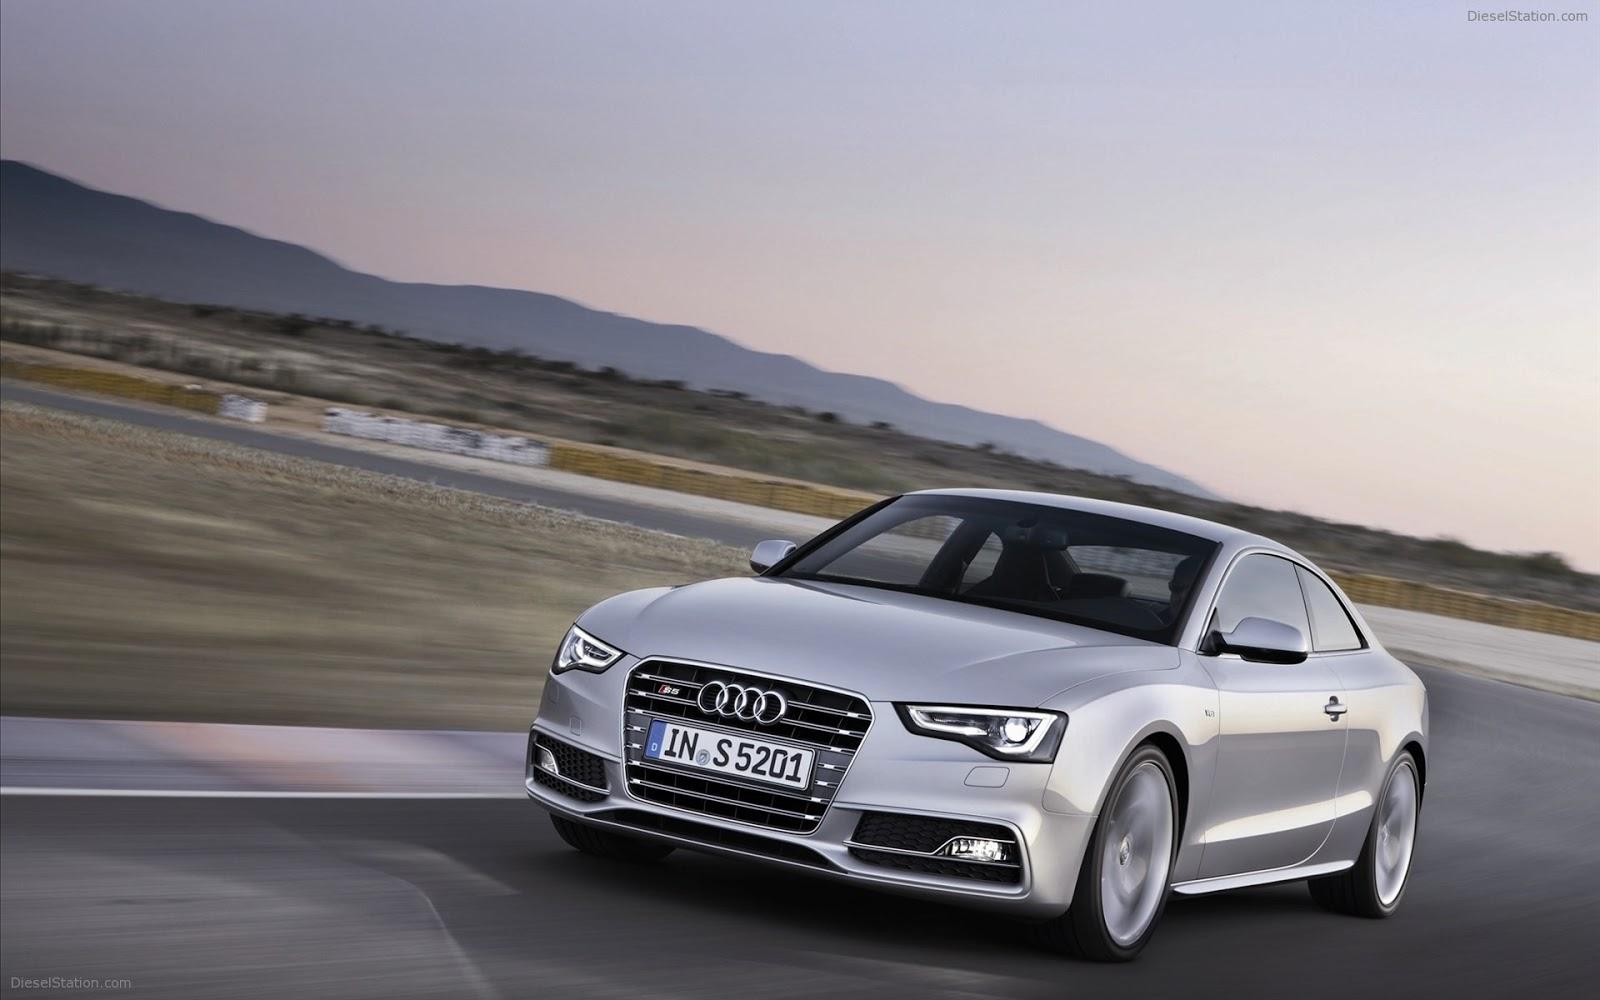 Worldu0027s Expensive Car Wallpapers,Audi Car Photos In HD,Audi Car Pics For  Mobile,Audi Car 2013 New Wallpapers